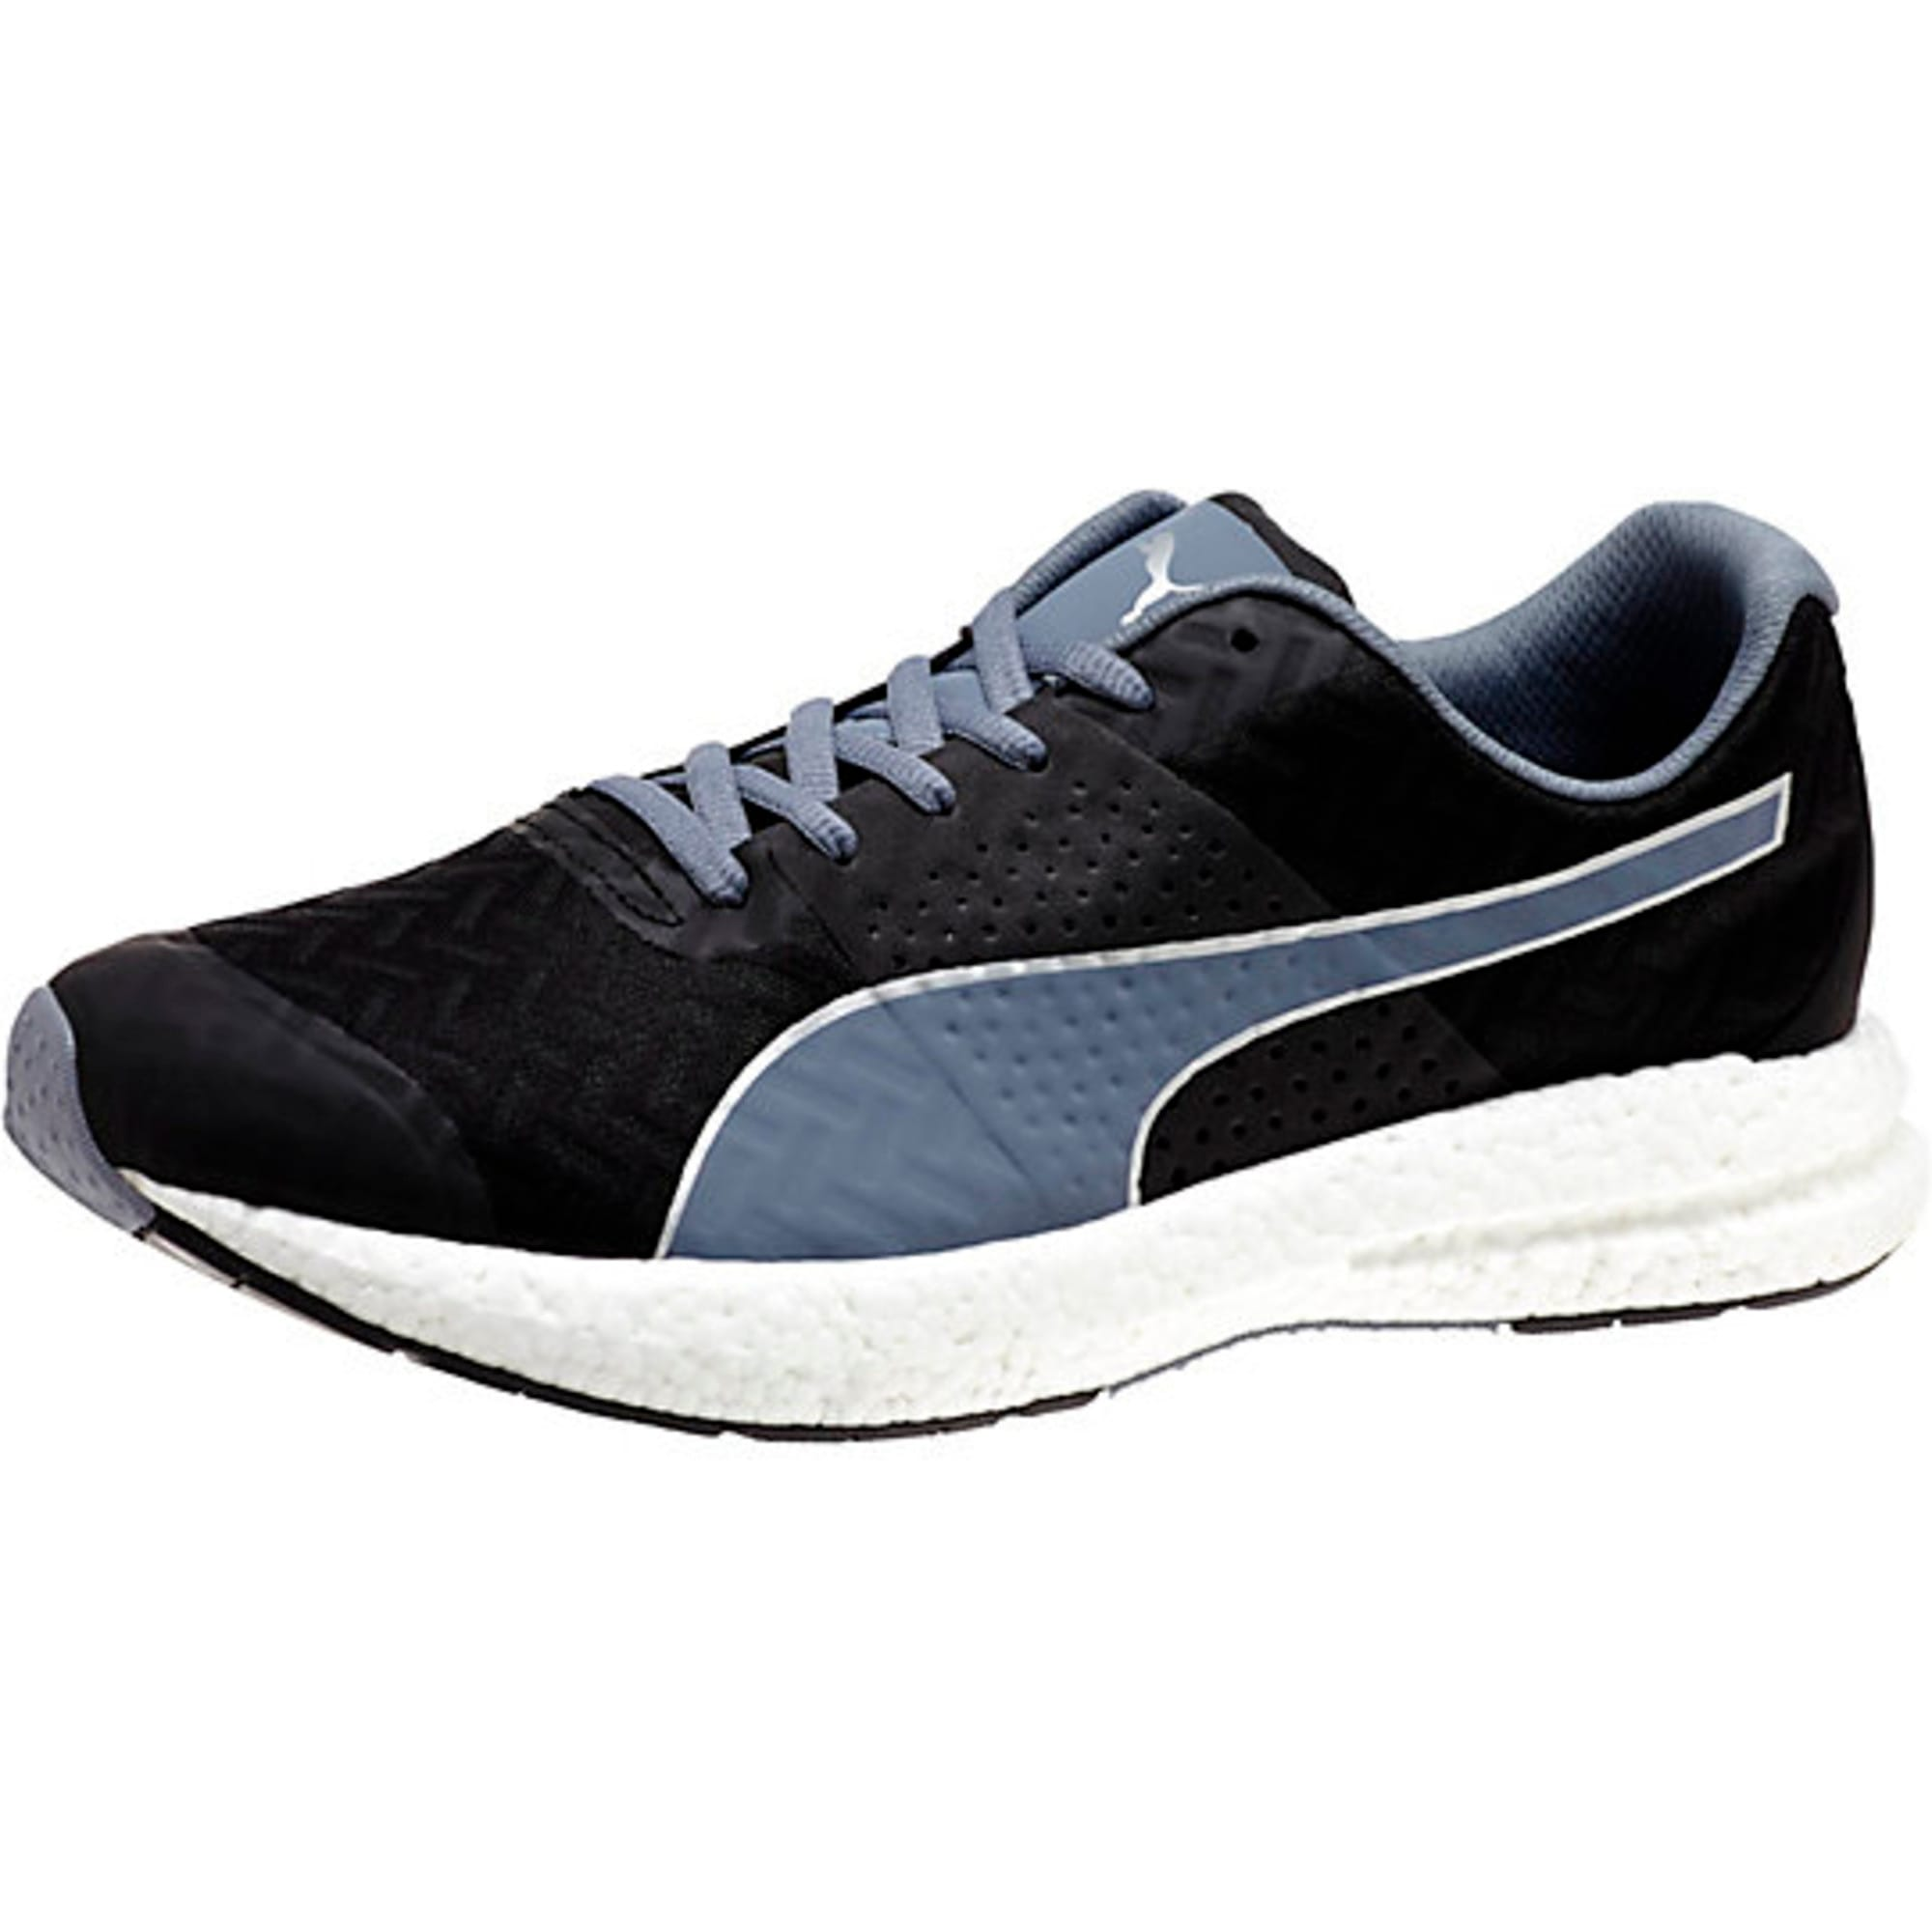 Thumbnail 1 of NRGY Running Shoes, black-folkstone gray, medium-IND